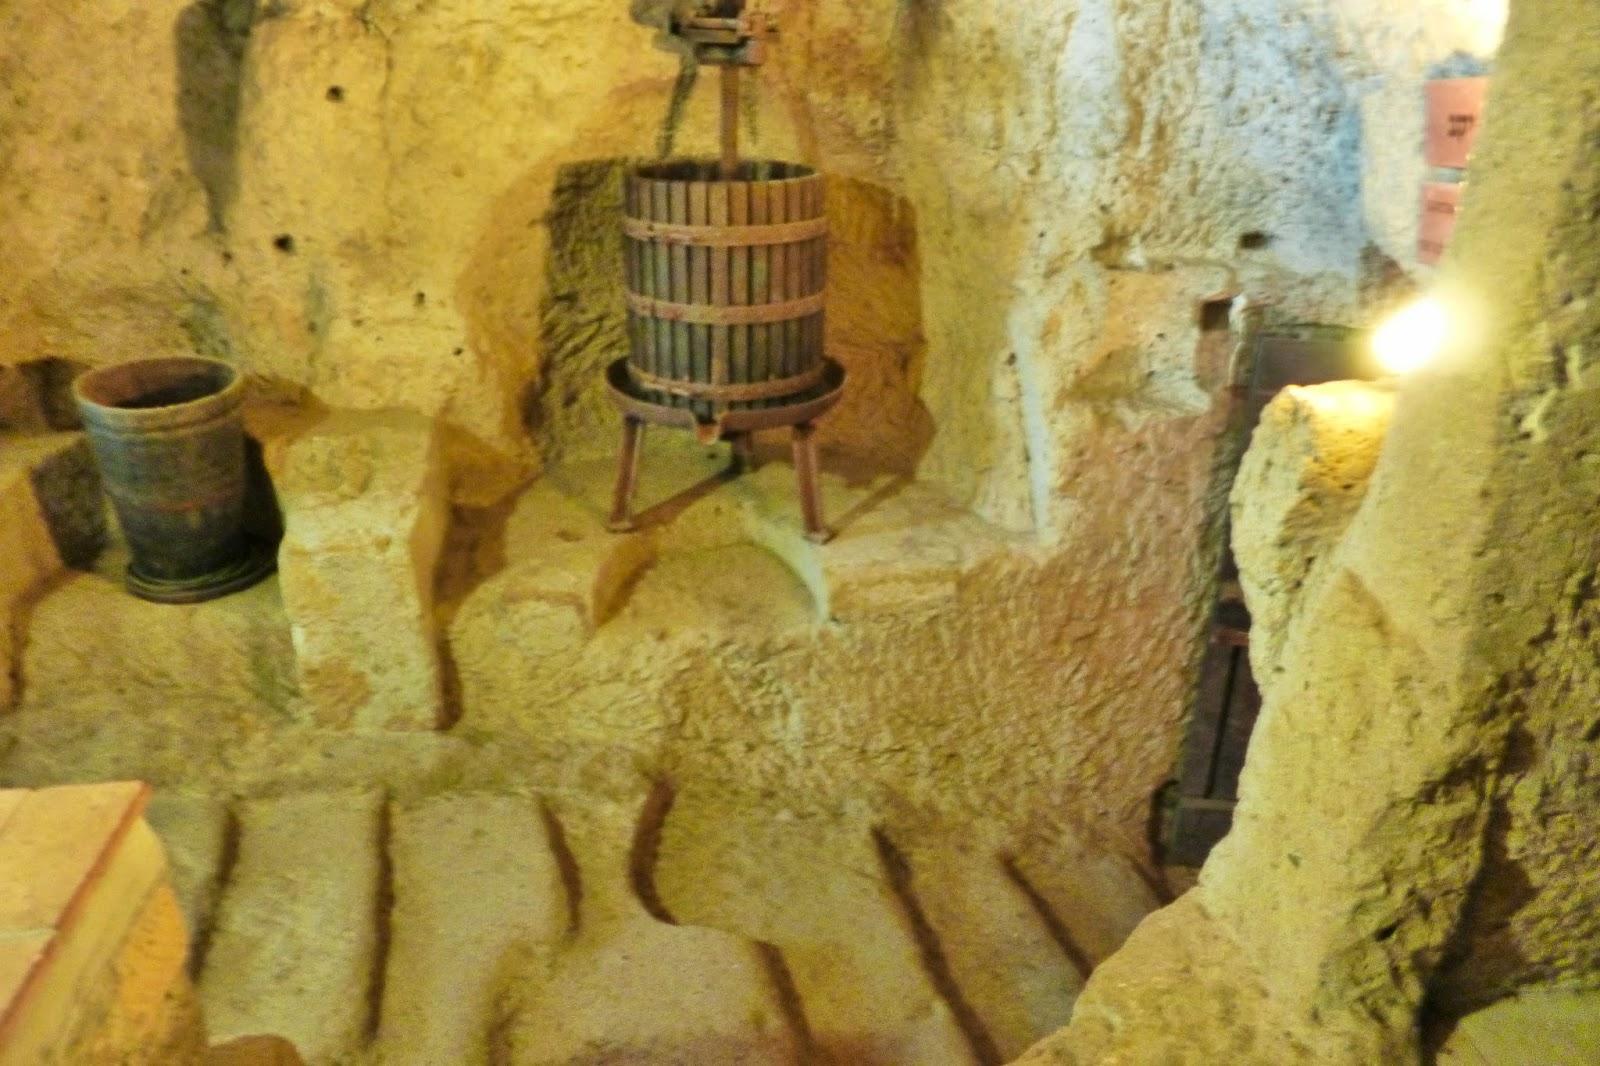 Pitigliano adega pequena jerusalem - Pitigliano, cultura e vinho na Toscana da Maremma!